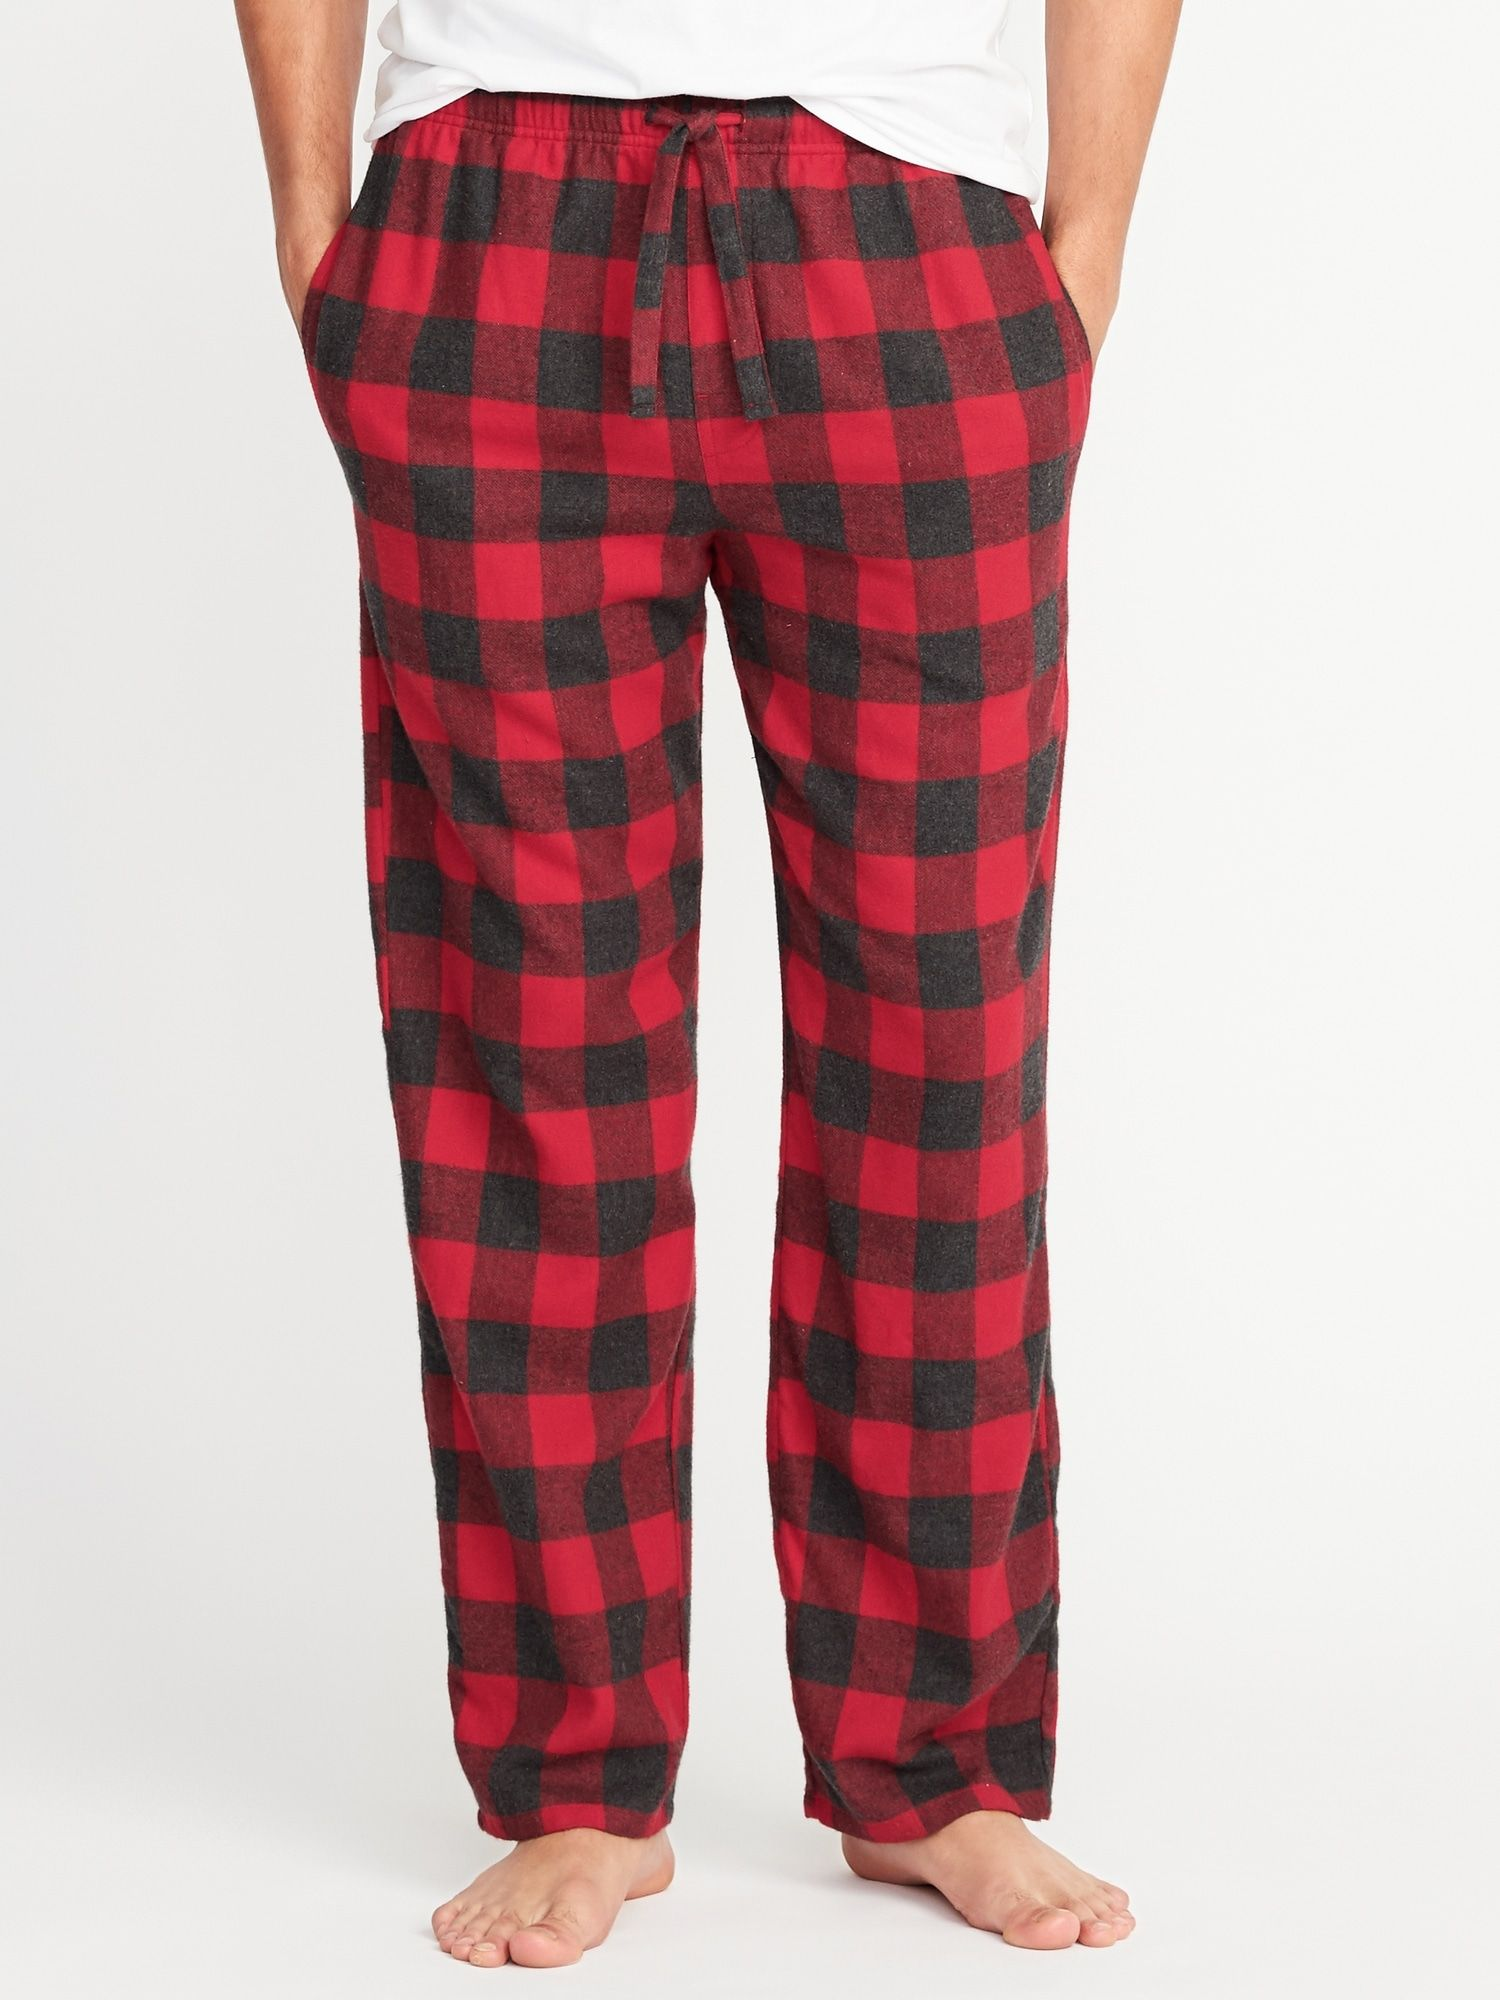 223b5b12cf832 Old Navy Flannel PJ Pants (Men's) | An Assassin's Life | Pants ...